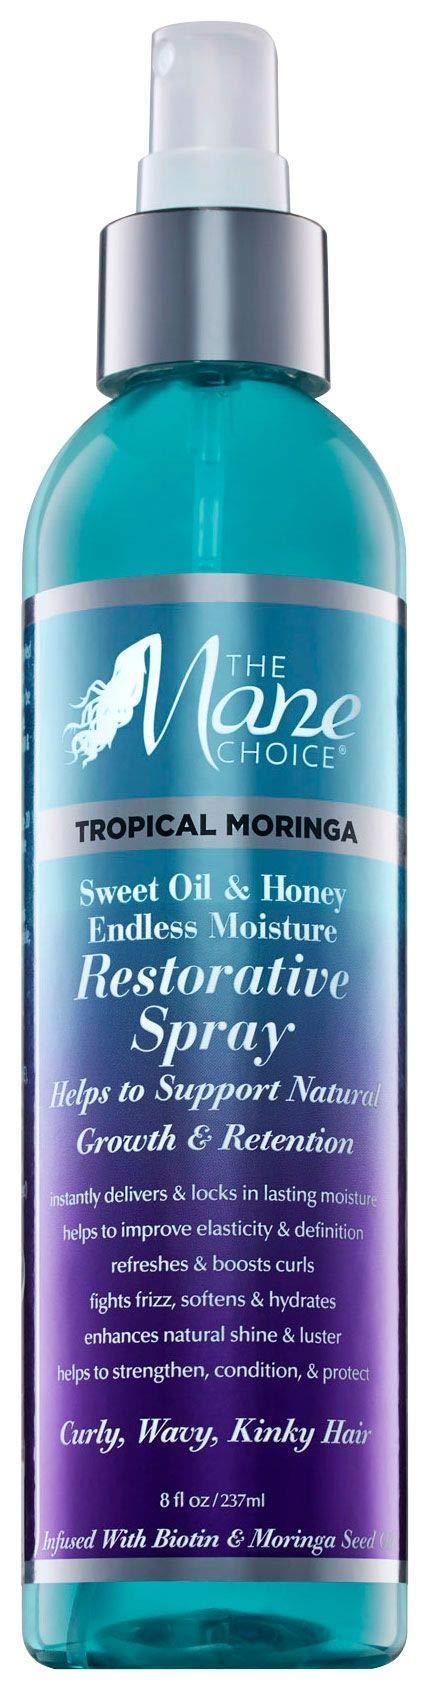 THE MANE CHOICE - Tropical Moringa Sweet Oil & Honey Endless Moisture Restorative Spray (8 fl. oz.)